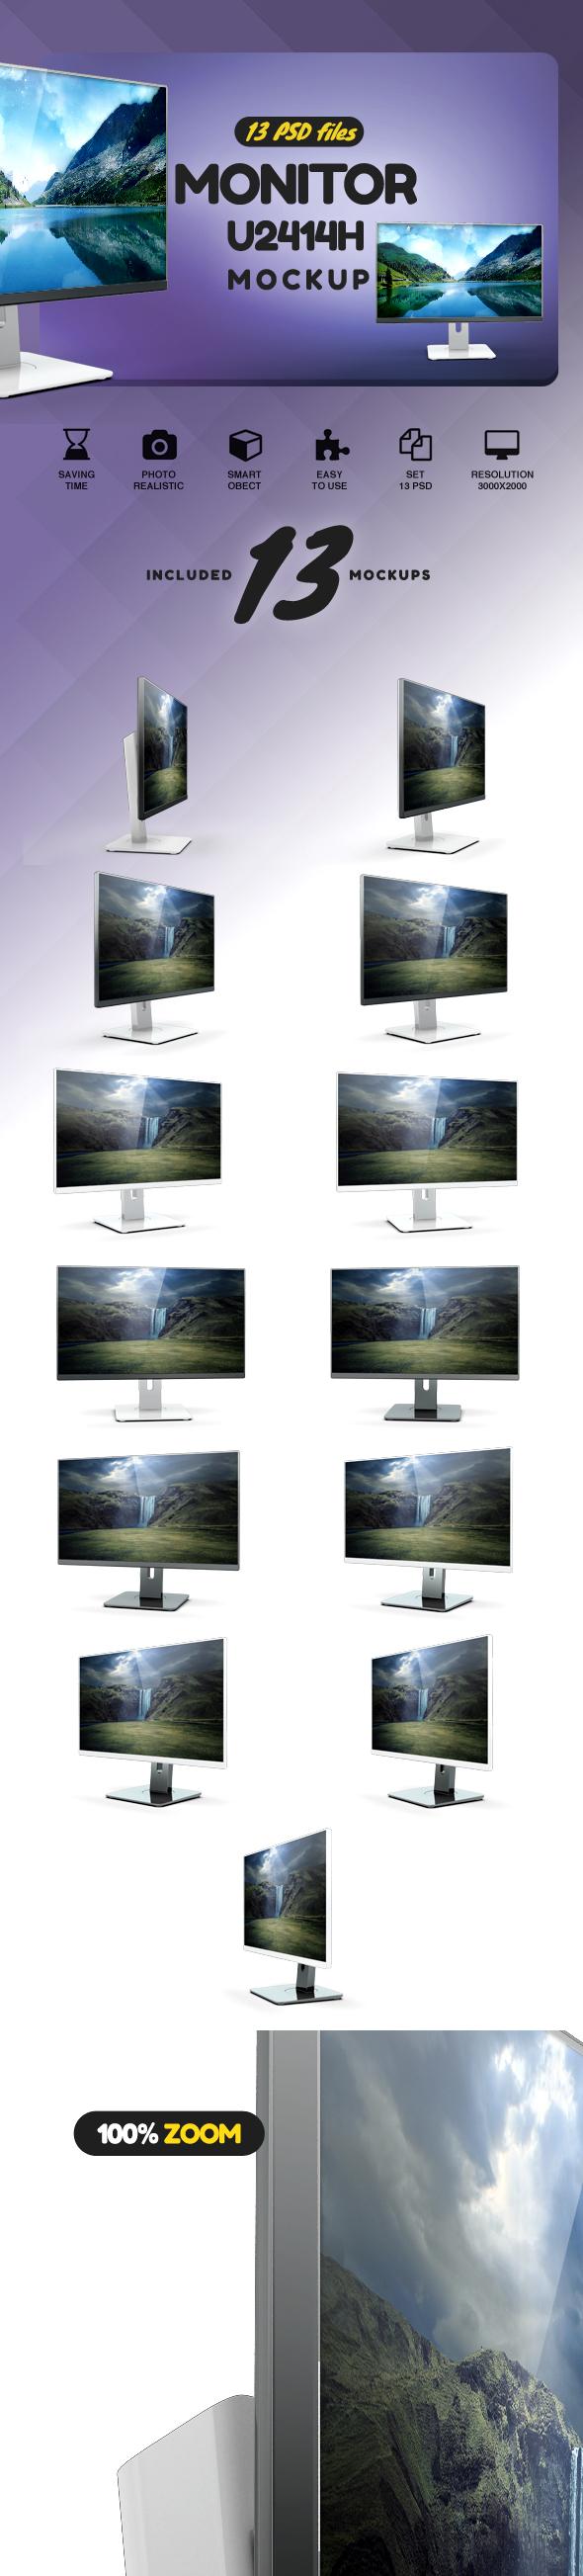 Monitor U2414h Mockup example image 2